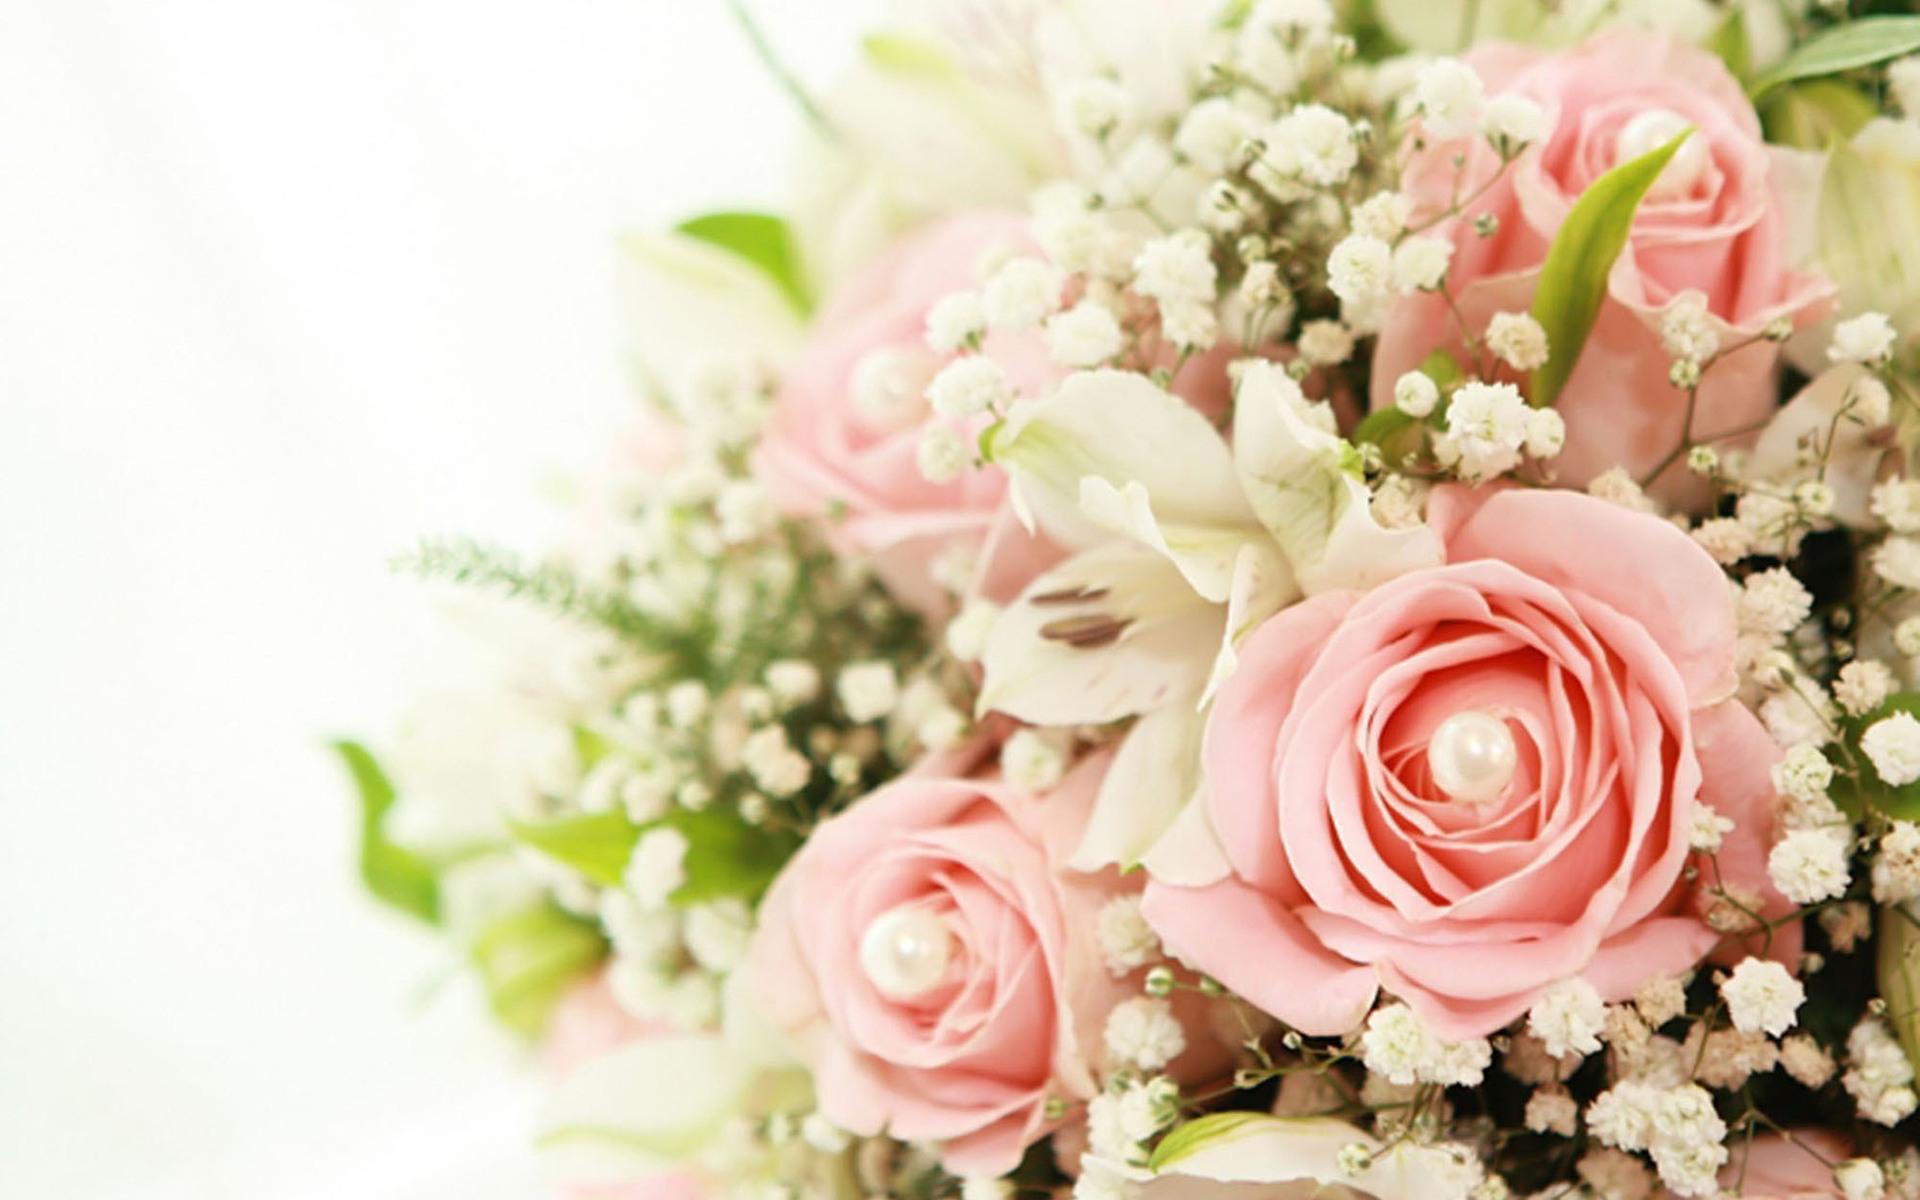 Фото цветов поздравления, аниме наруто